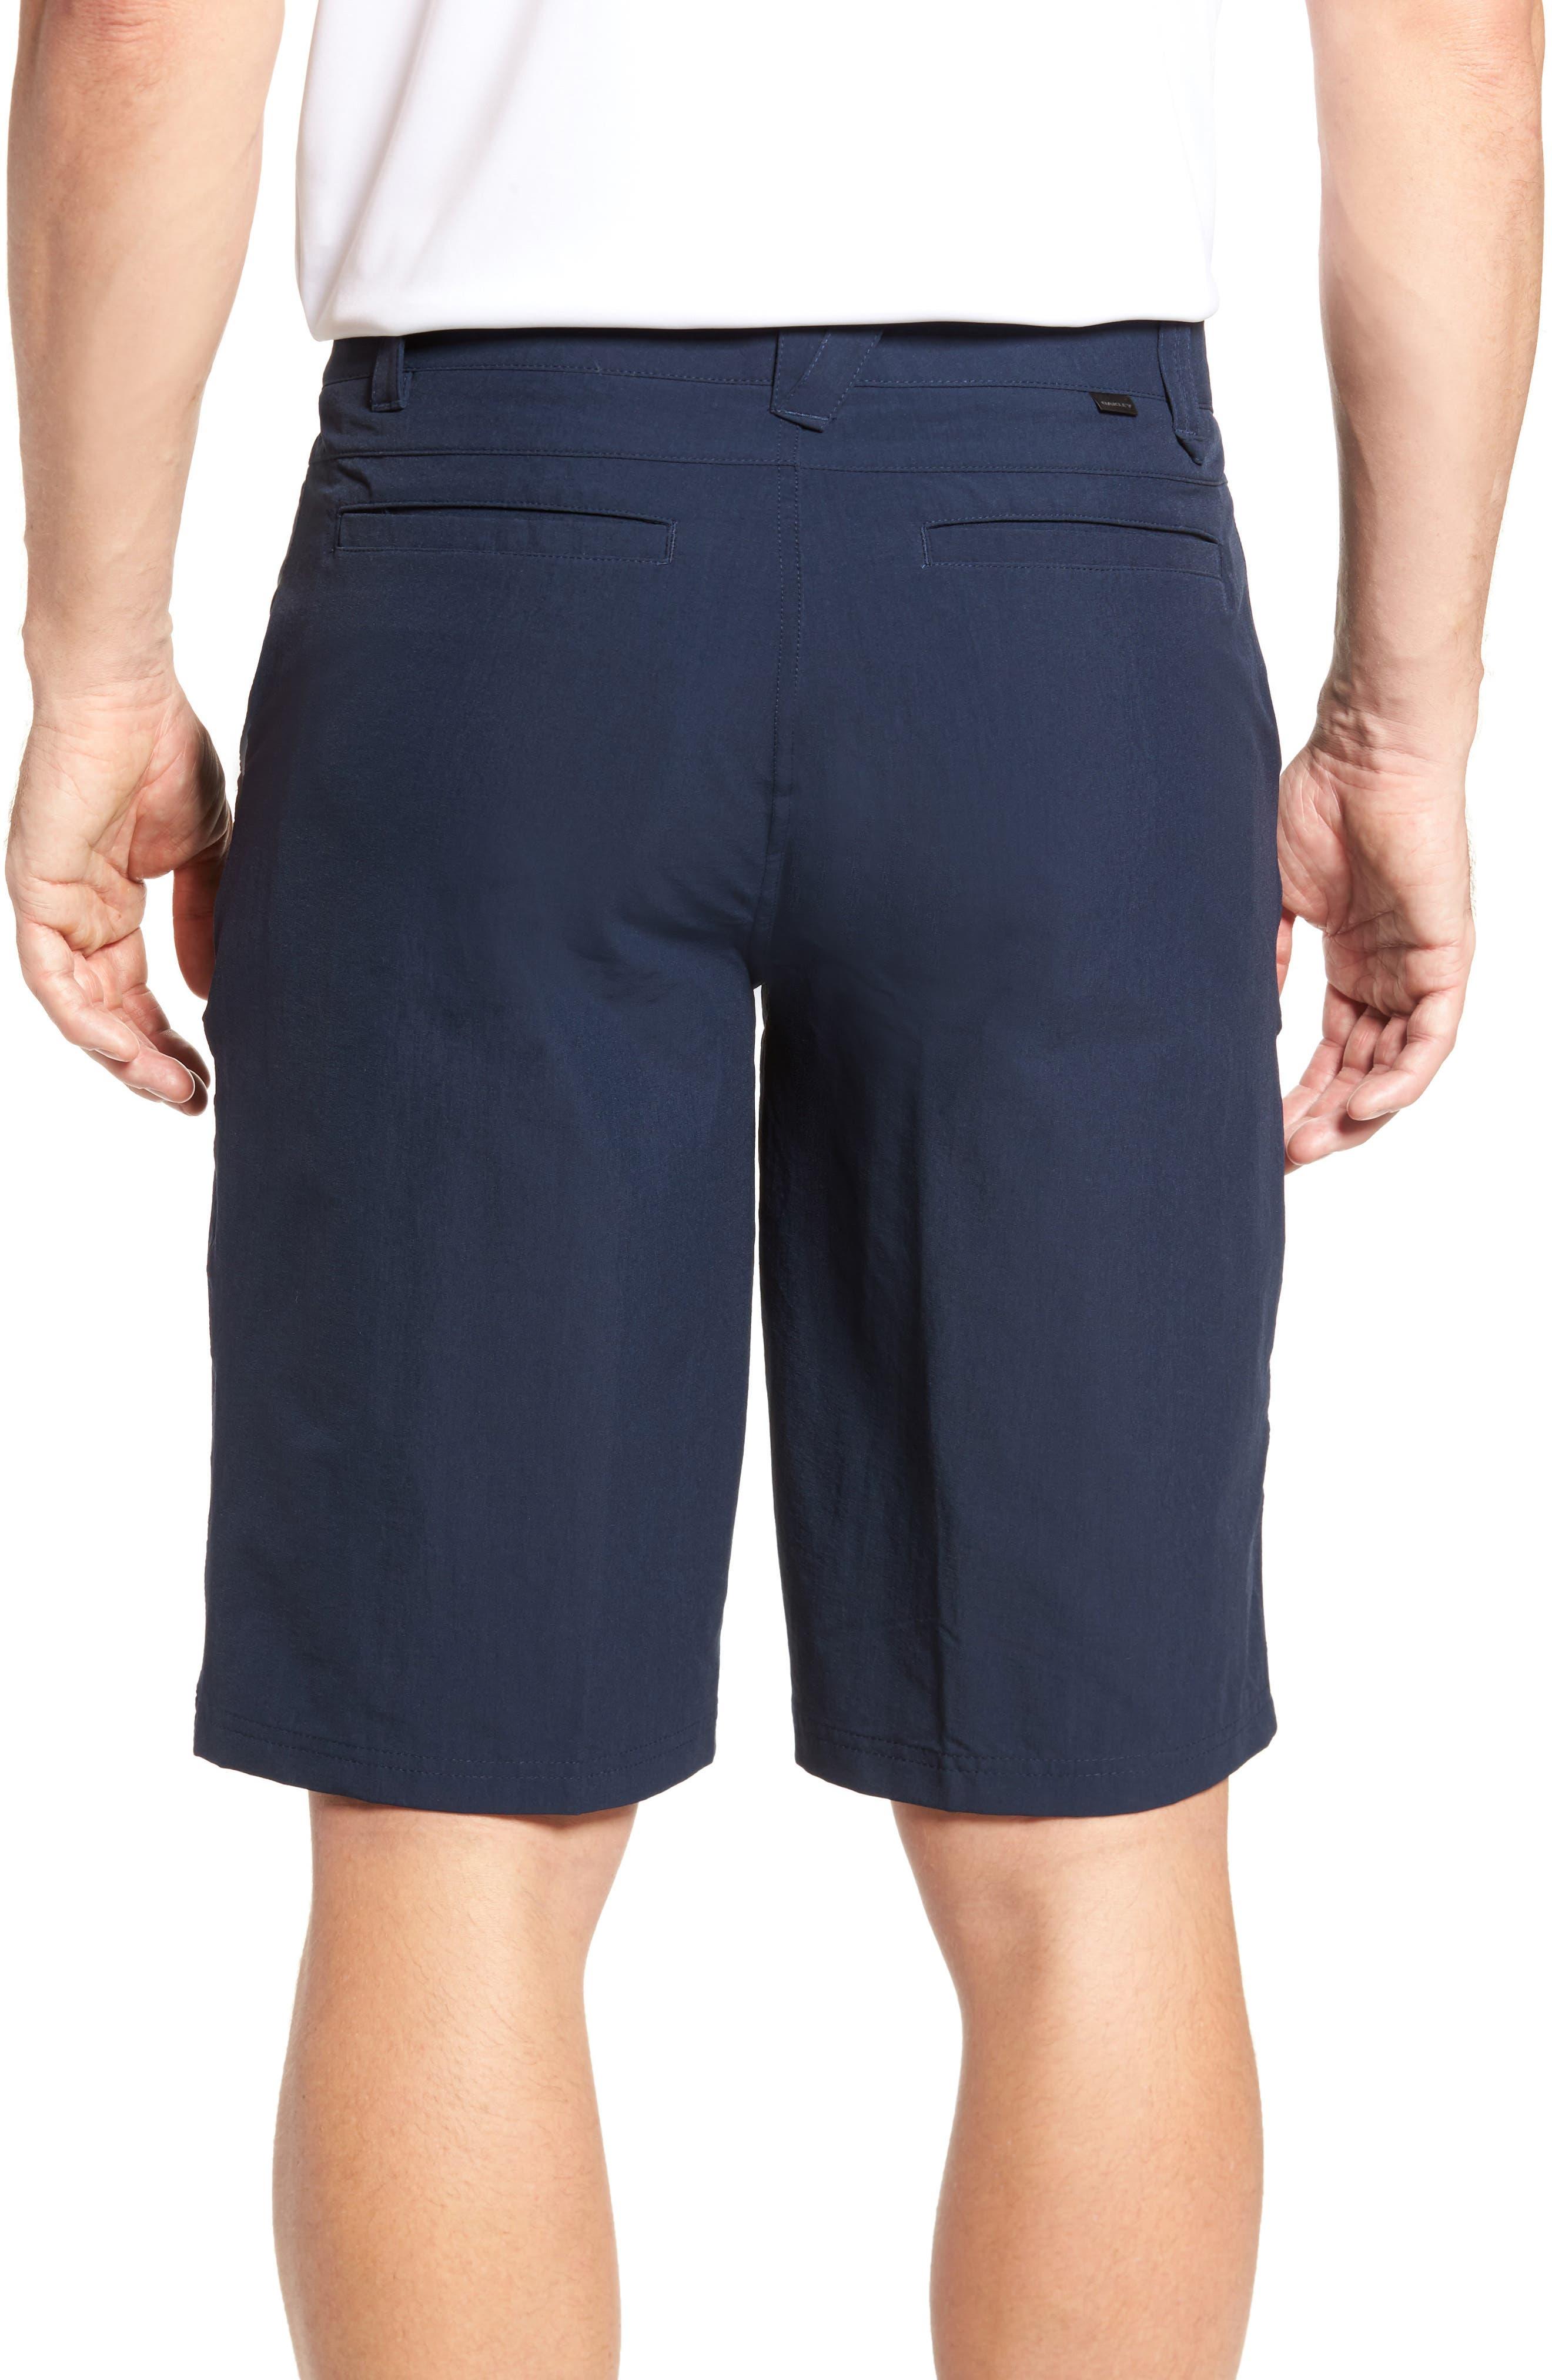 Take 2.5 Shorts,                             Alternate thumbnail 2, color,                             Fathom